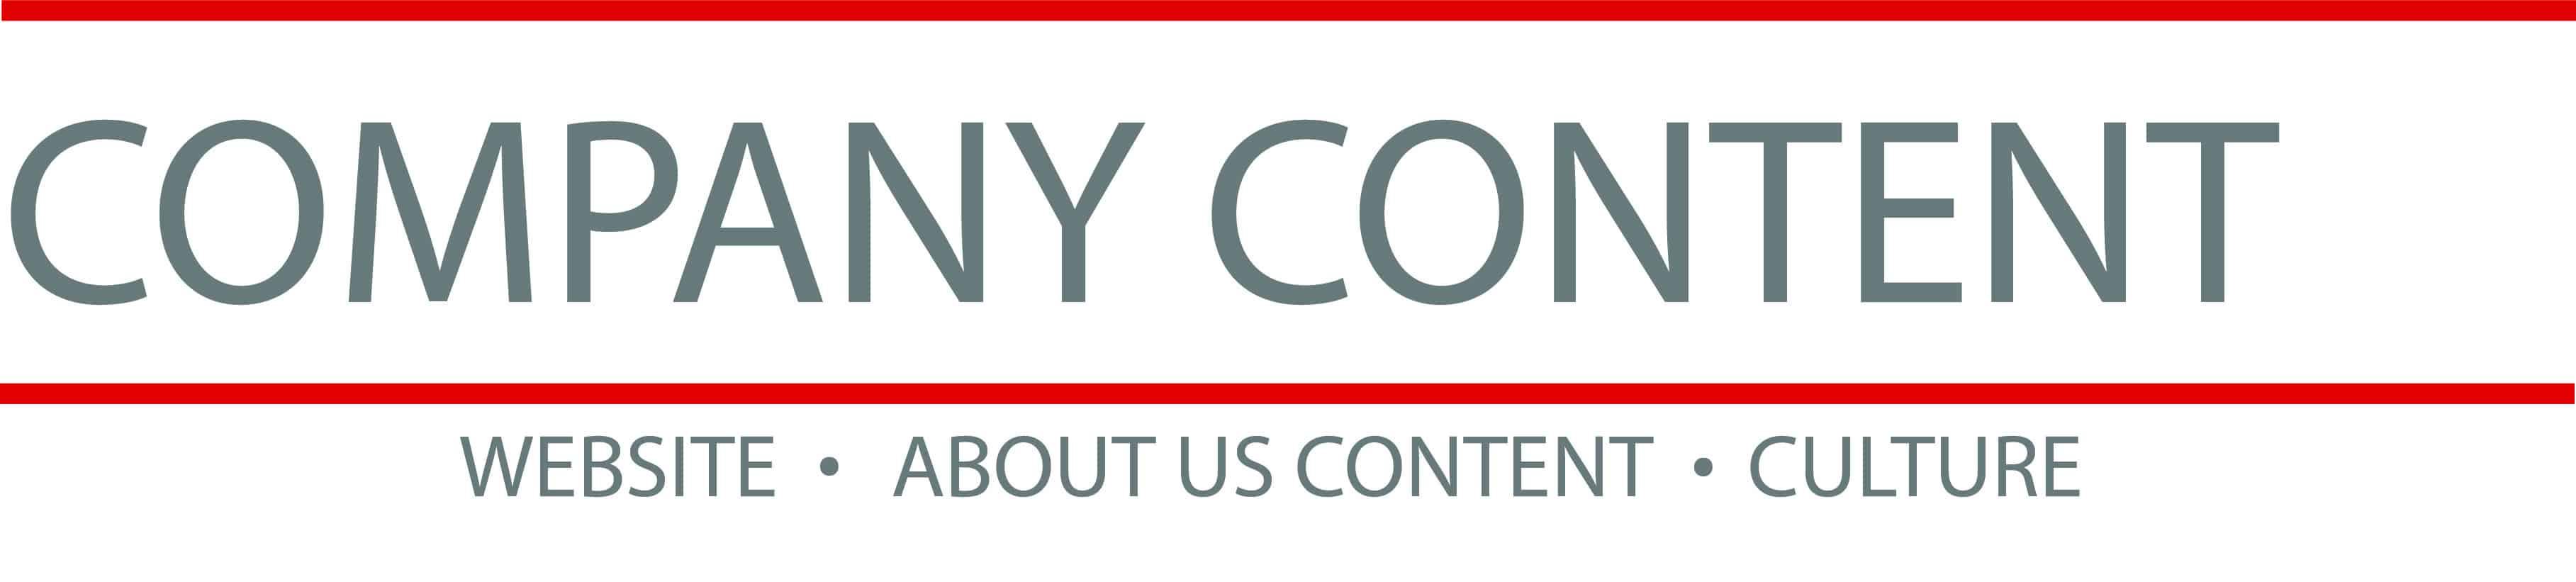 Company Content Title Graphic